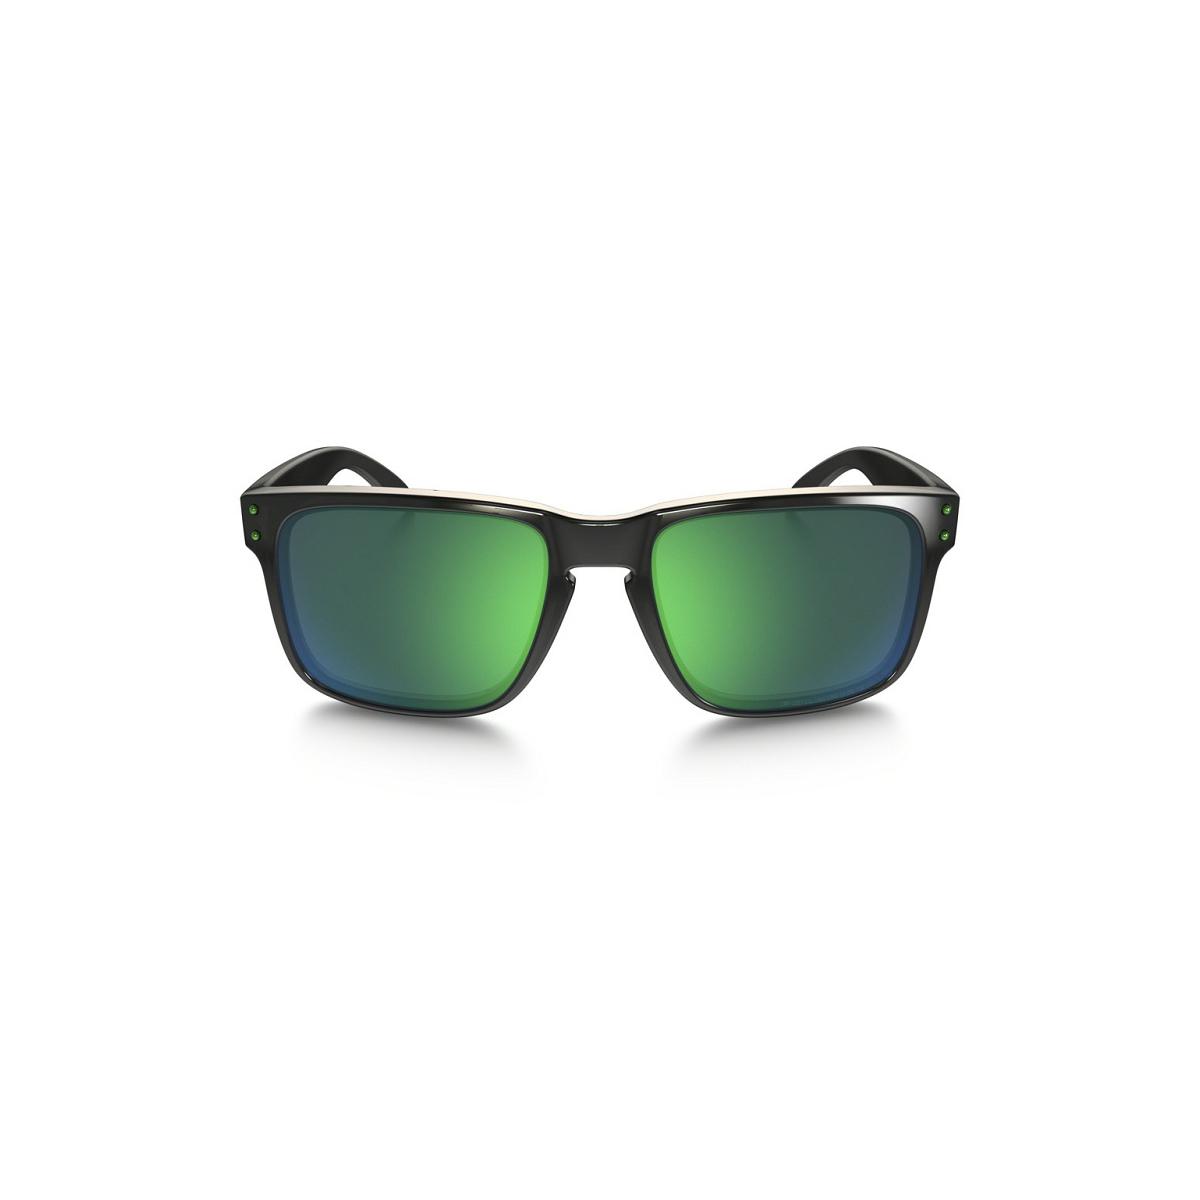 9cfd8594b8953 ... Óculos Oakley Holbrook Polished Black  Lente Jade Iridium Polarizado ...